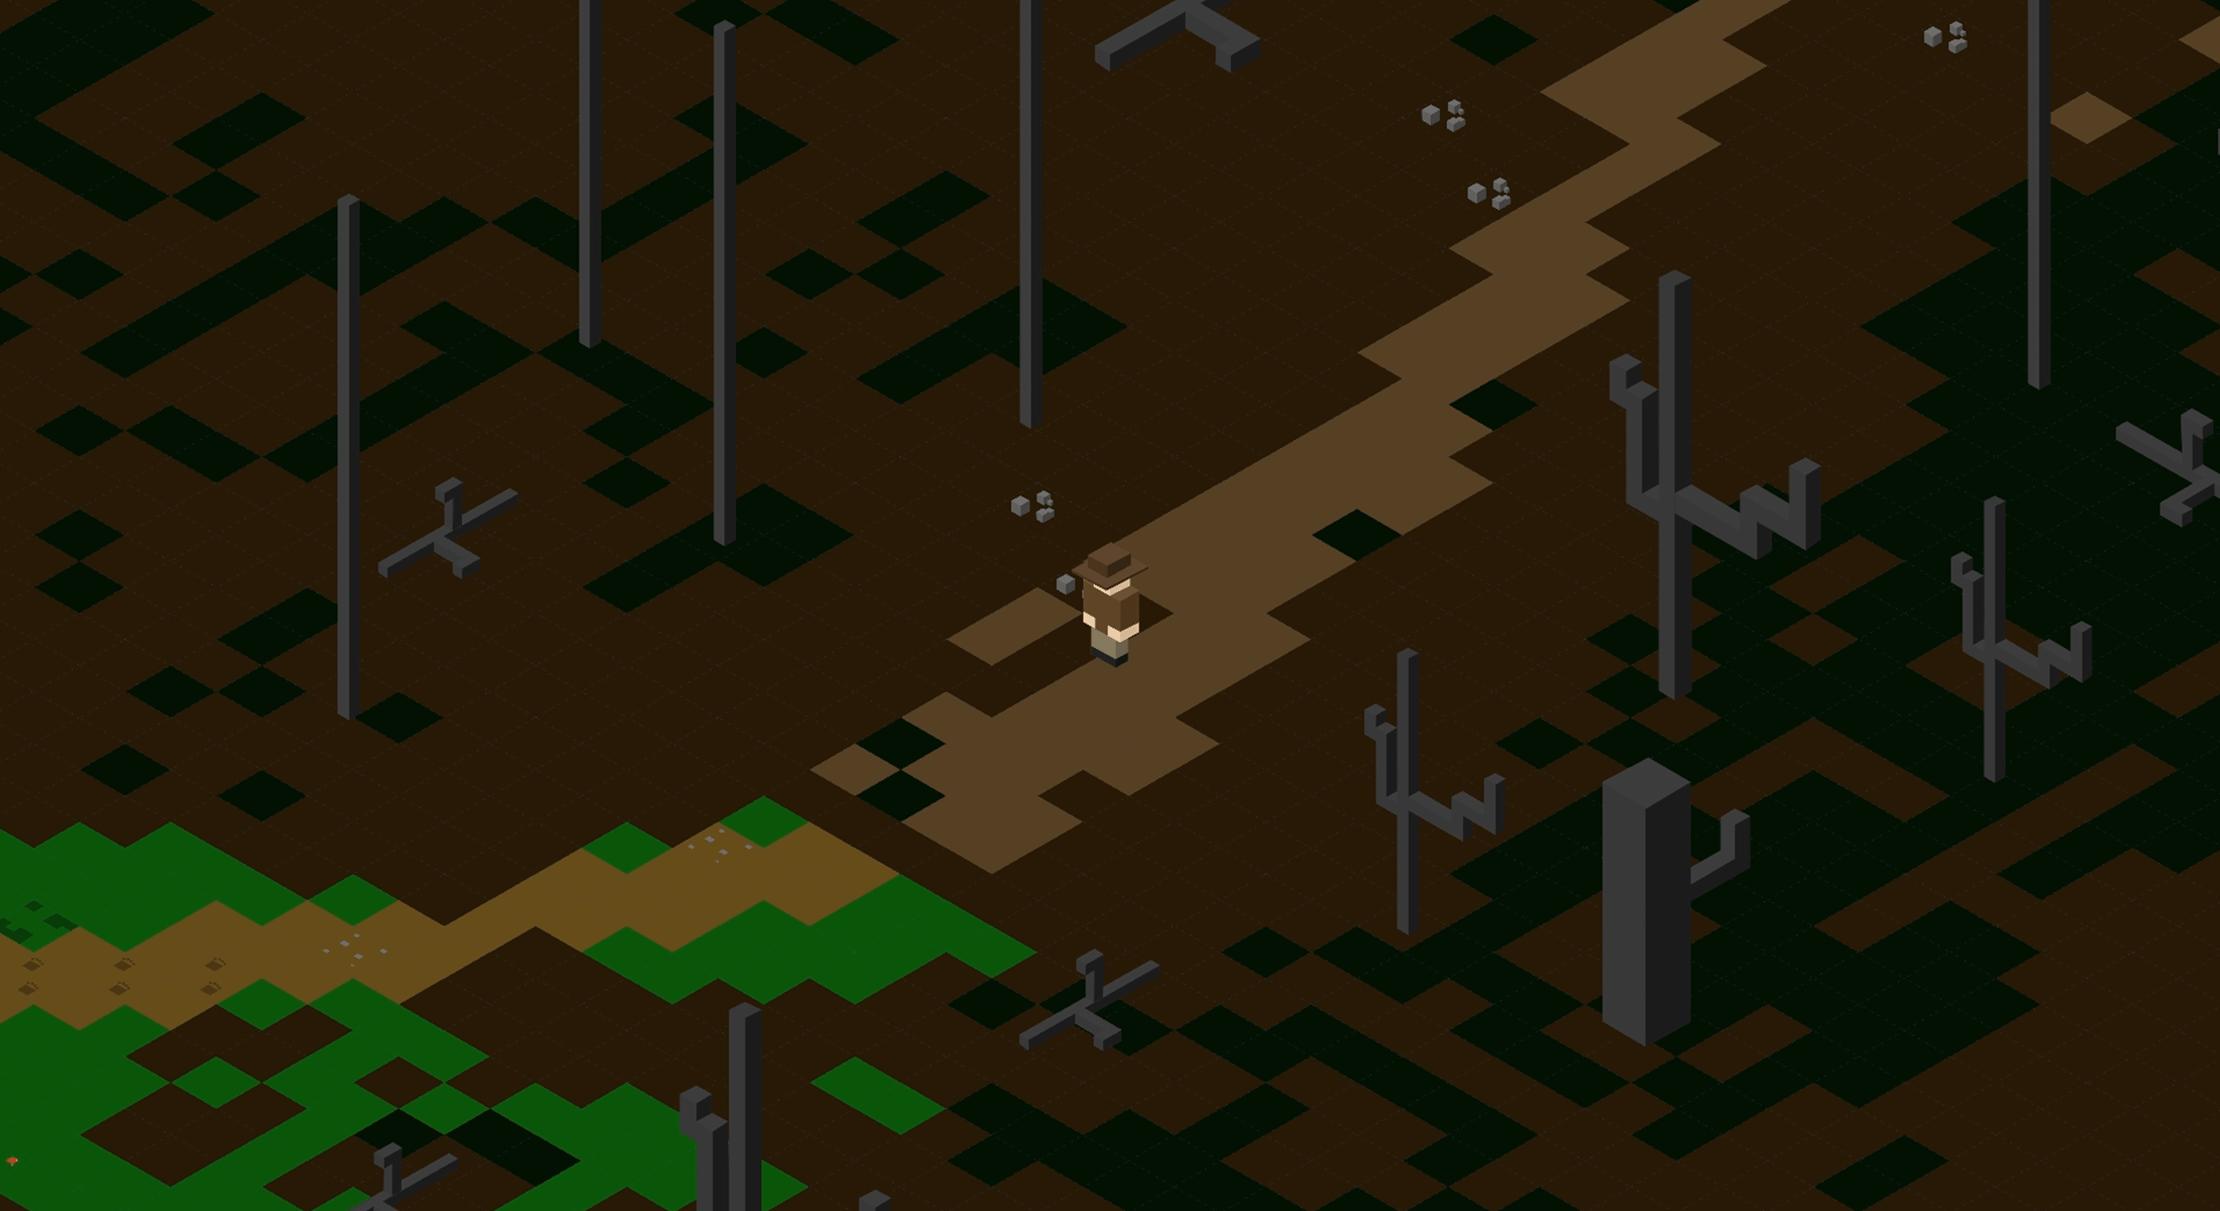 screenshot of jungle platform